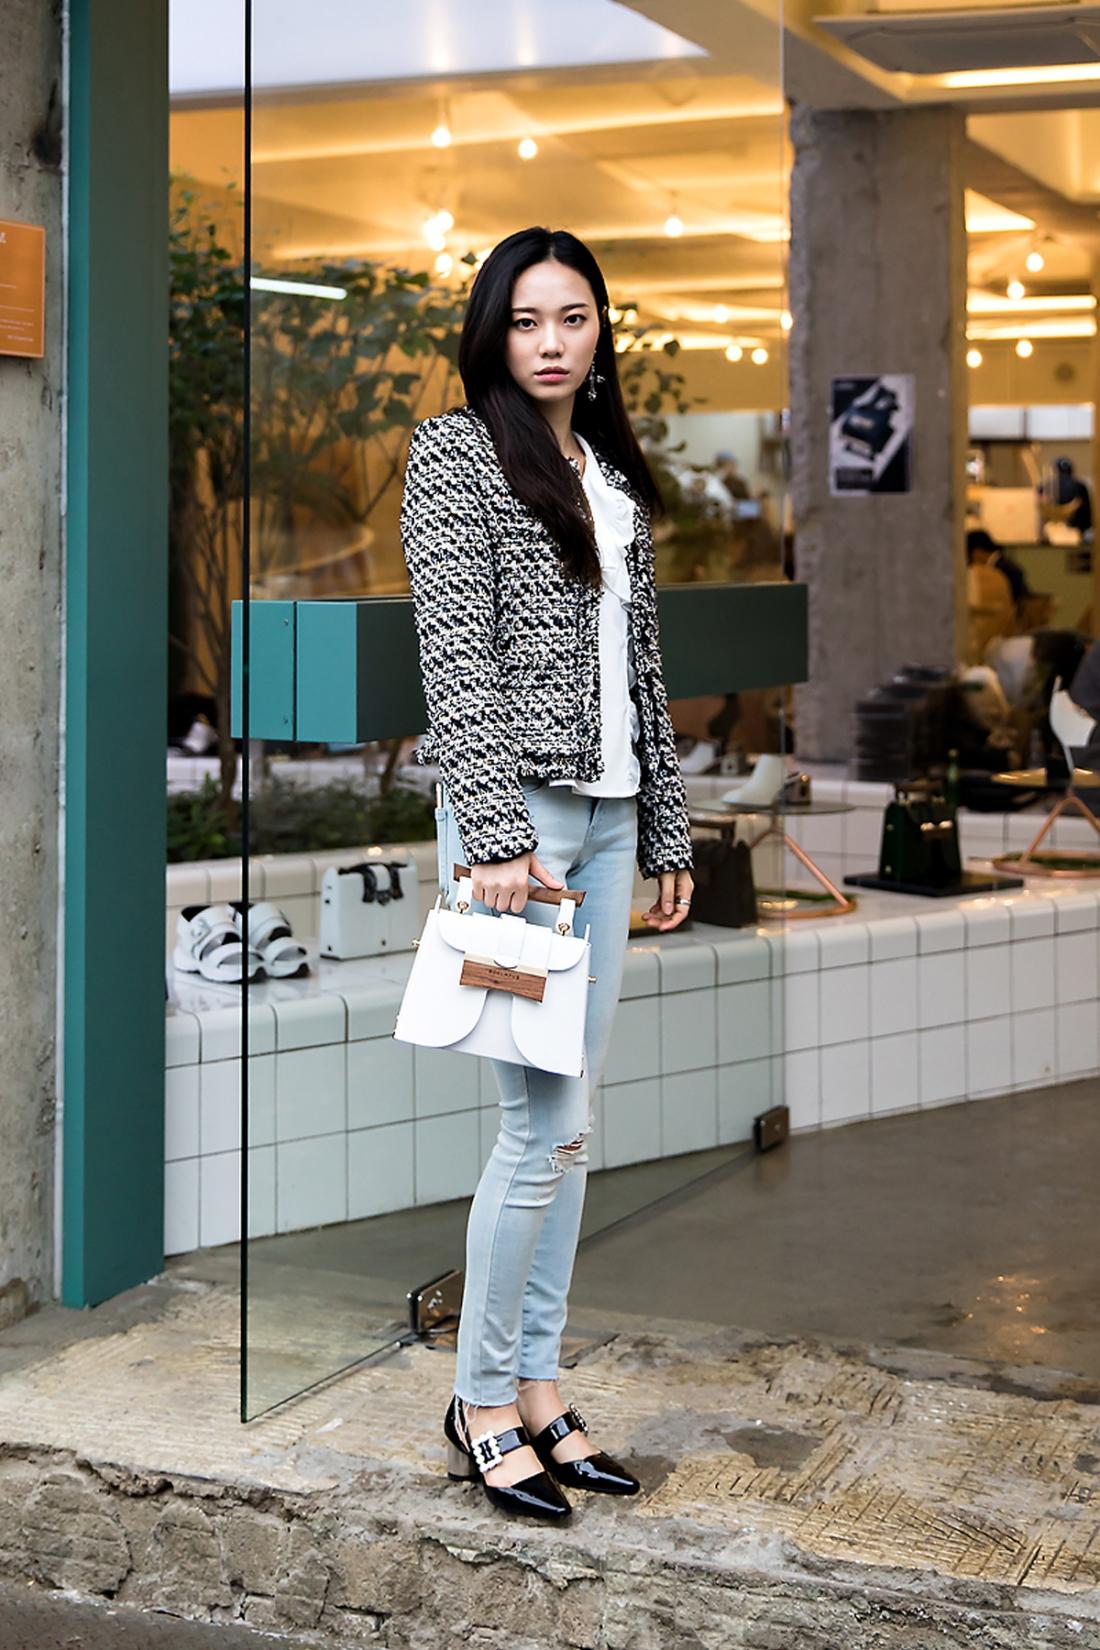 Choi Hyunjung, Street Fashion 2017 in Seoul.jpg